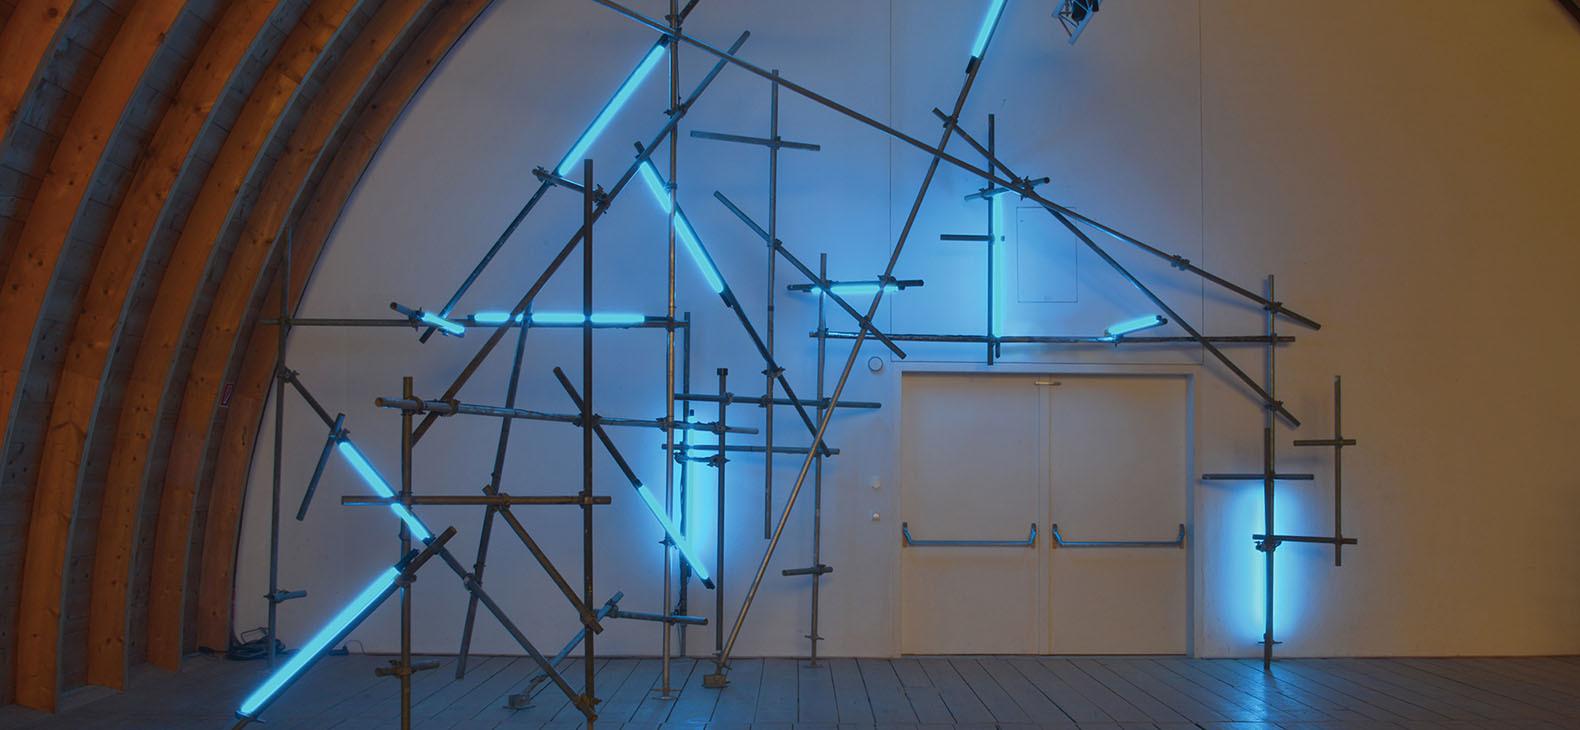 Schafhof Künstlerhaus - Ausstellung AUFTAKT: Rhythm Section - Christoph Dahlhausen: Stabilizing Light (Freising), 2017